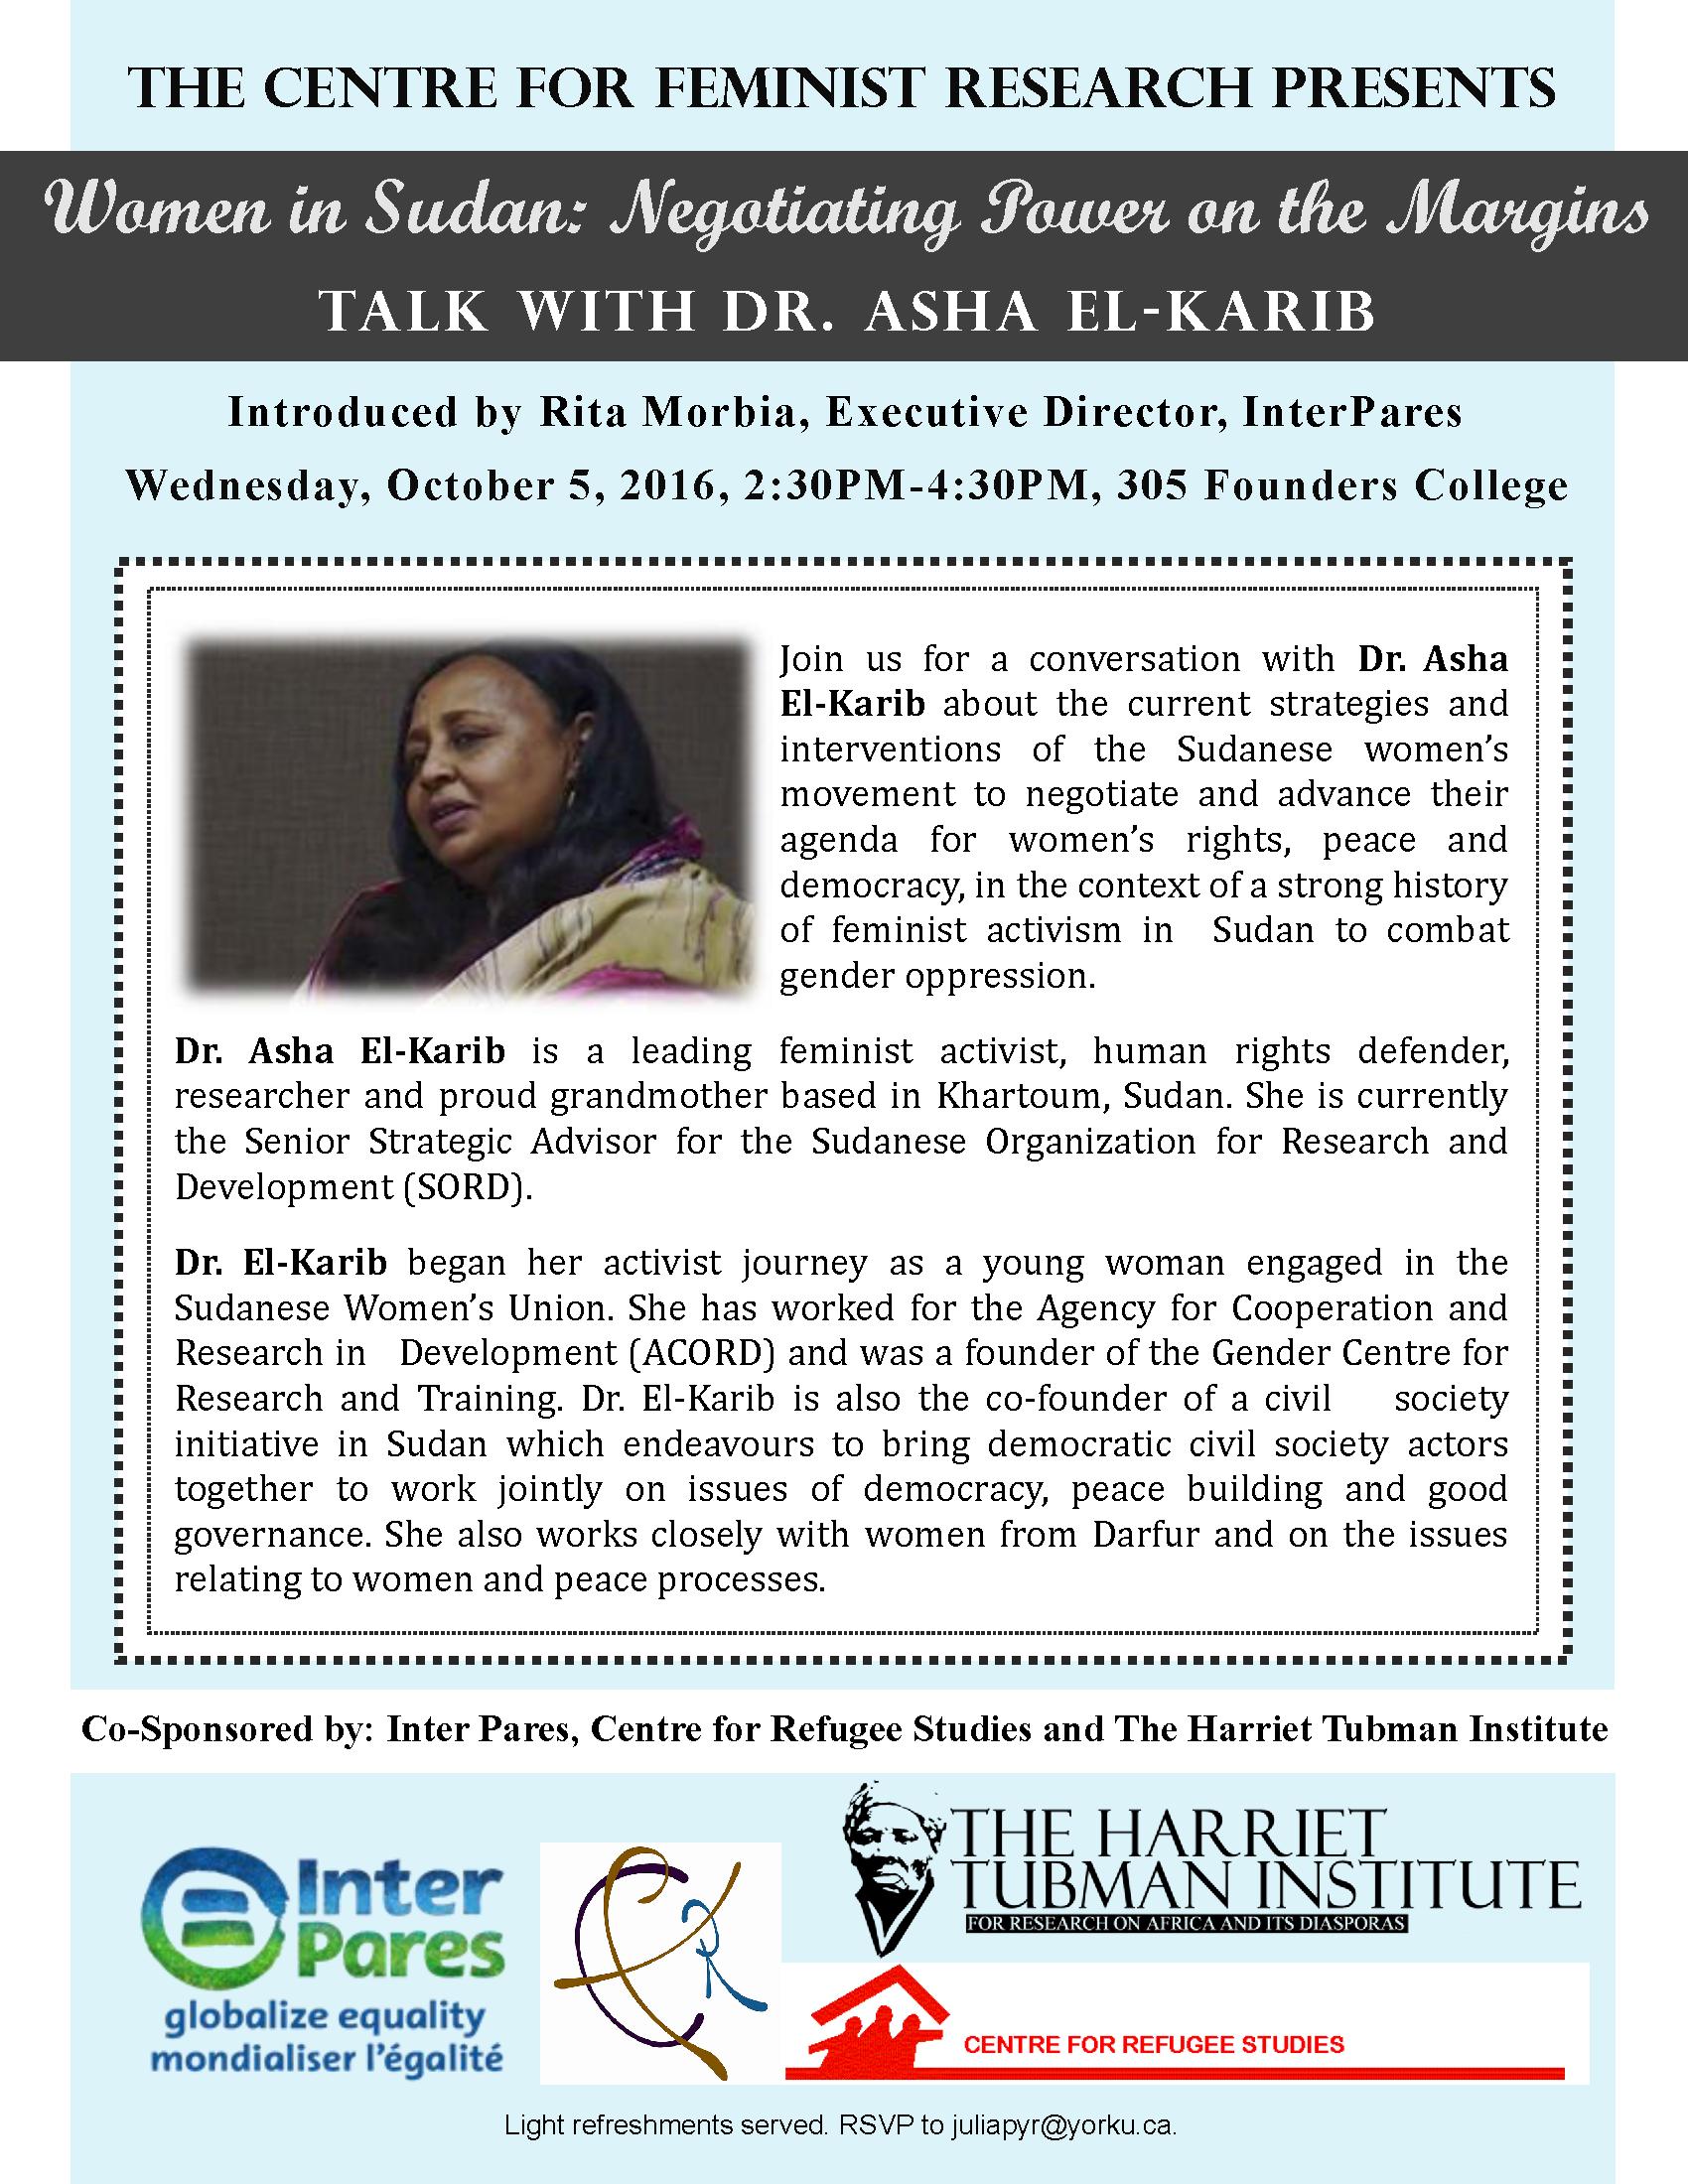 Women in Sudan: Negotiating Power on the Margins: Talk with Dr. Asha El-Karib @ Founders College 305